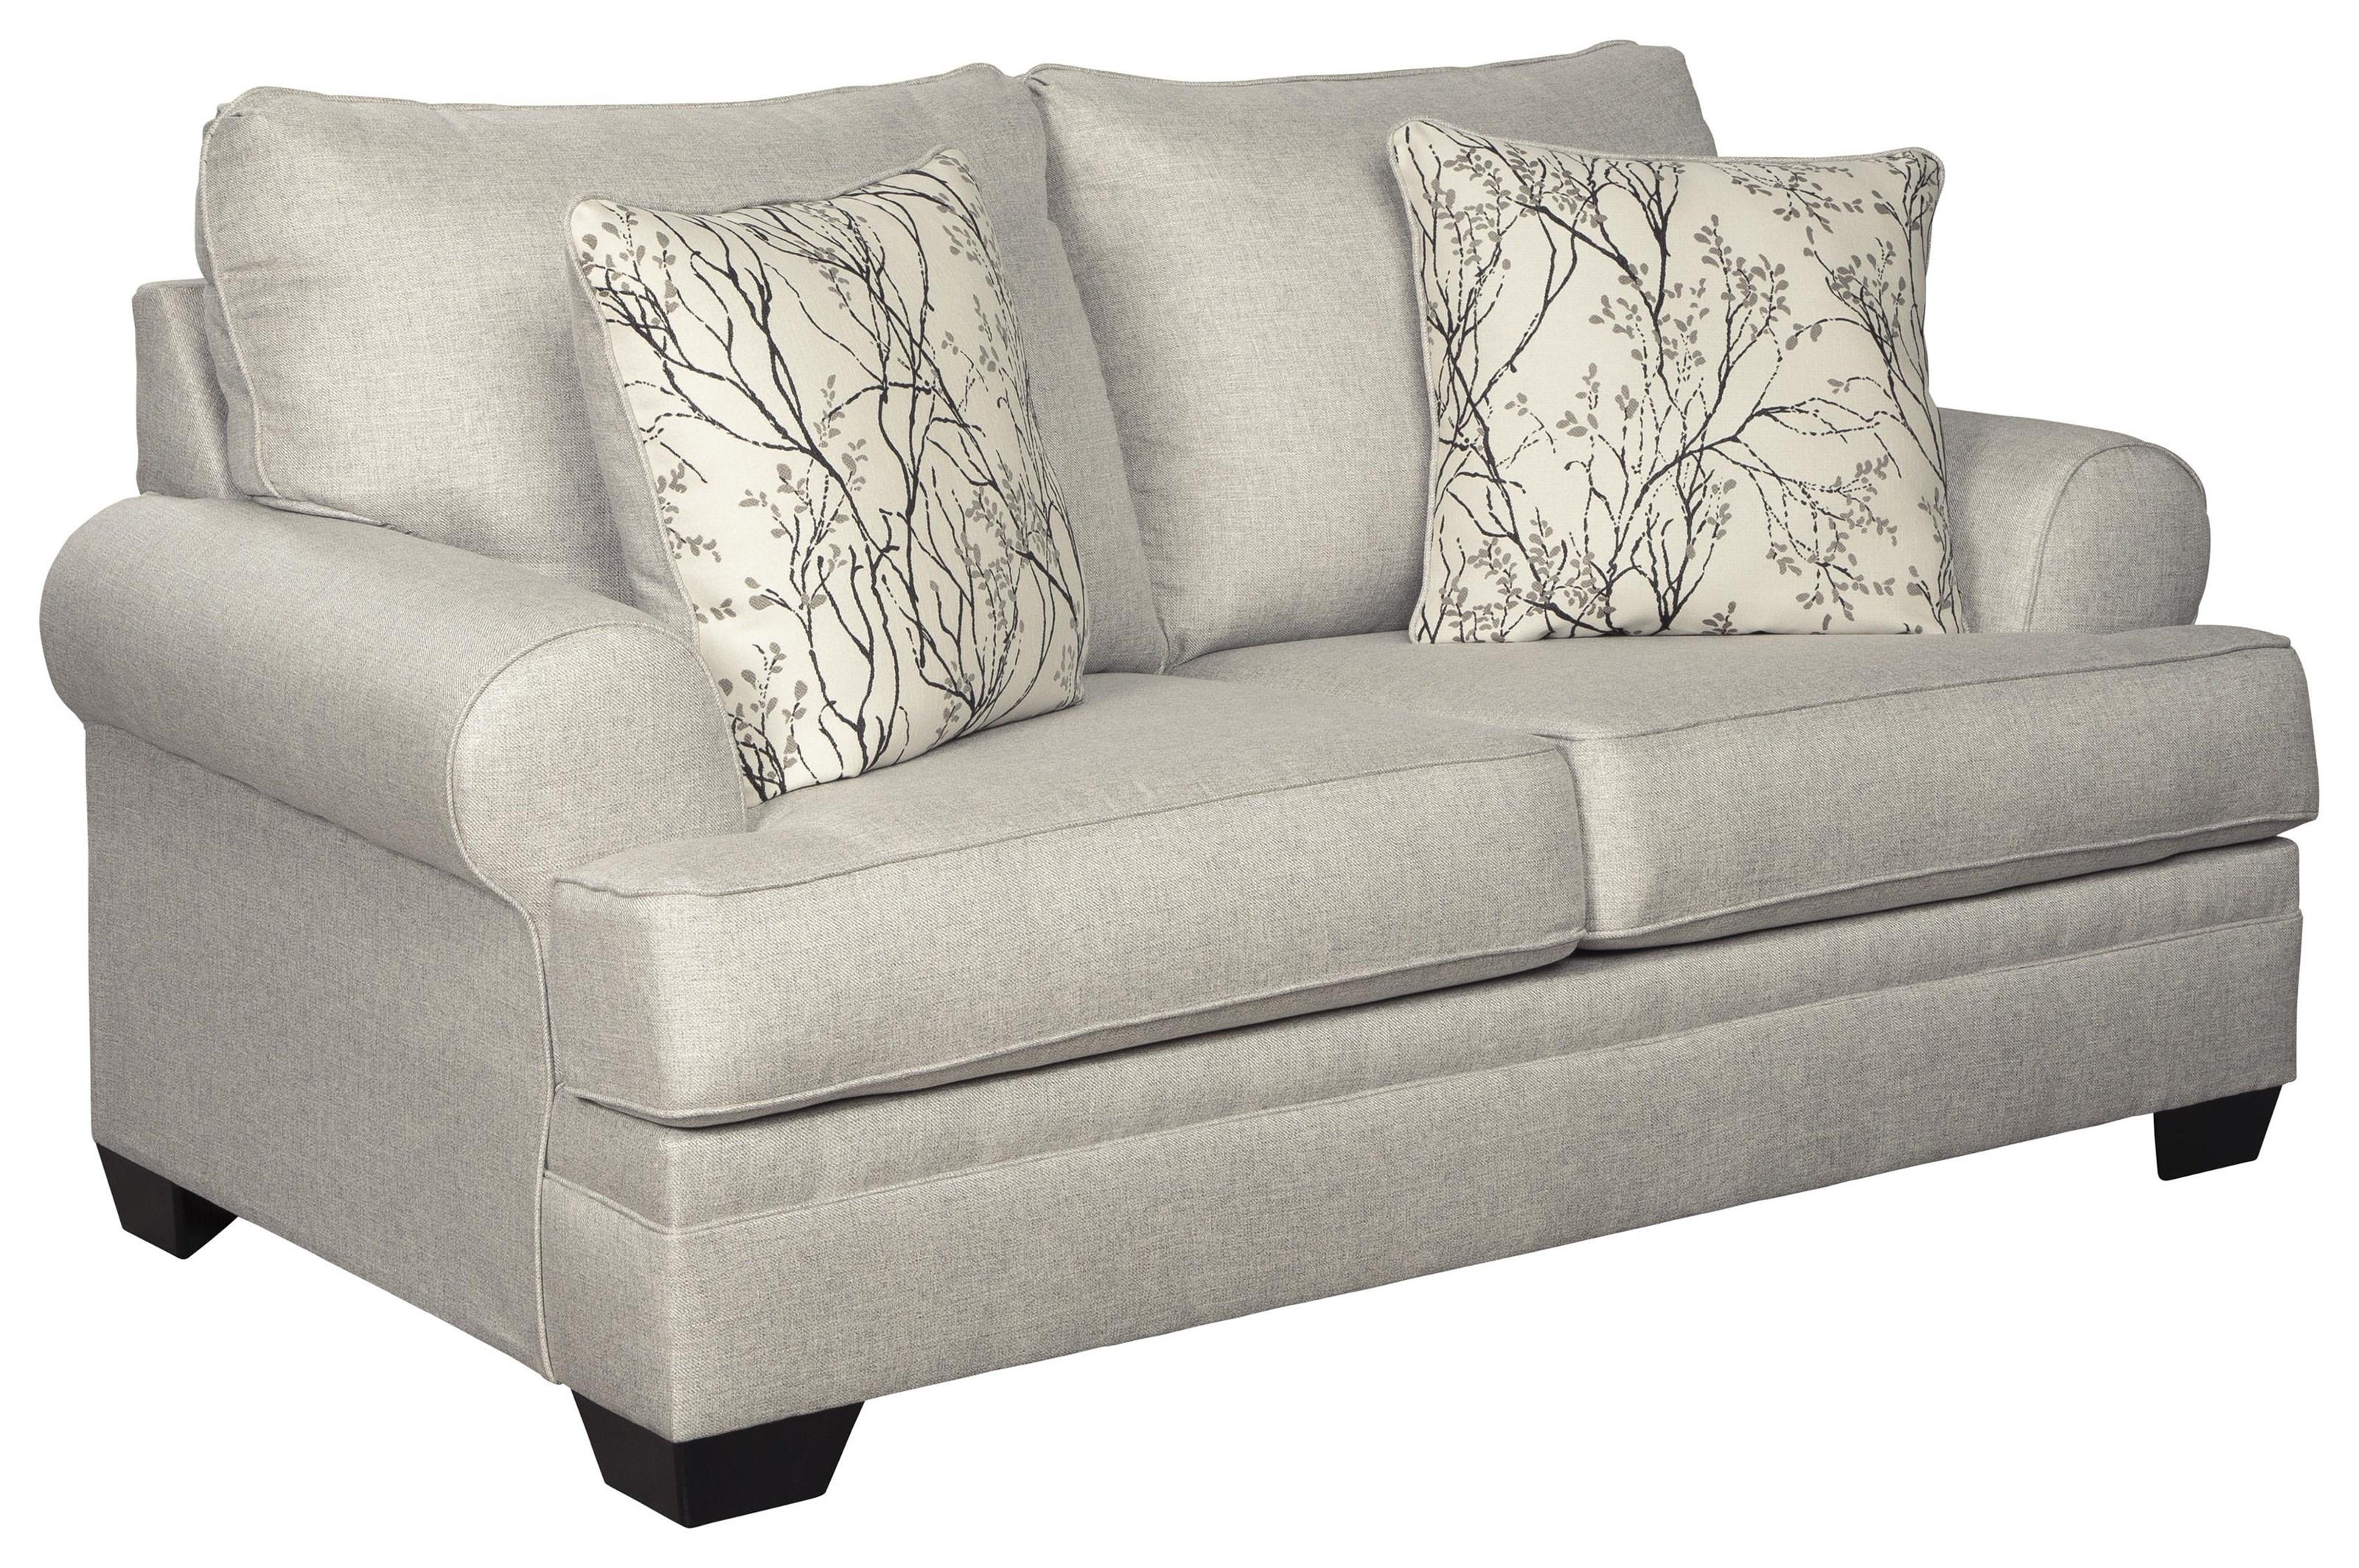 Antonlini Loveseat by Ashley Furniture at Sam Levitz Furniture